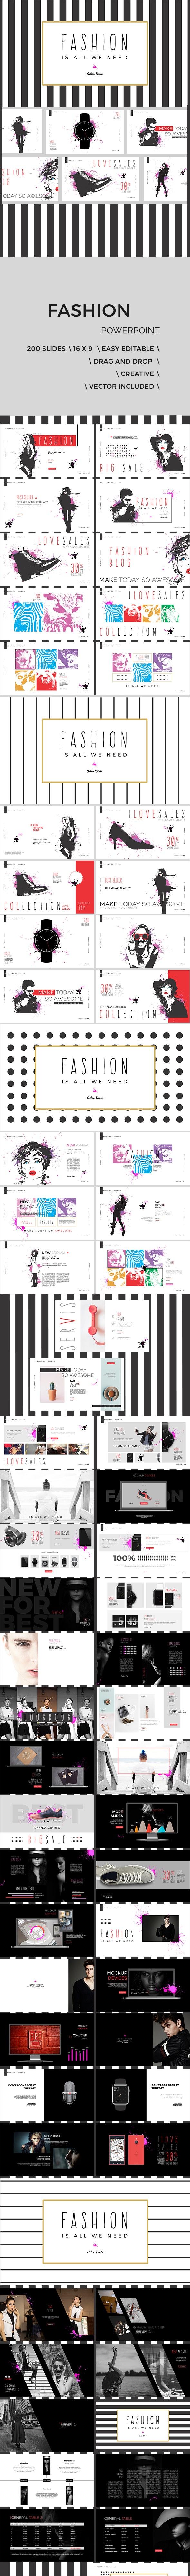 Art Fashion Powerpoint Presentation - PowerPoint Templates Presentation Templates